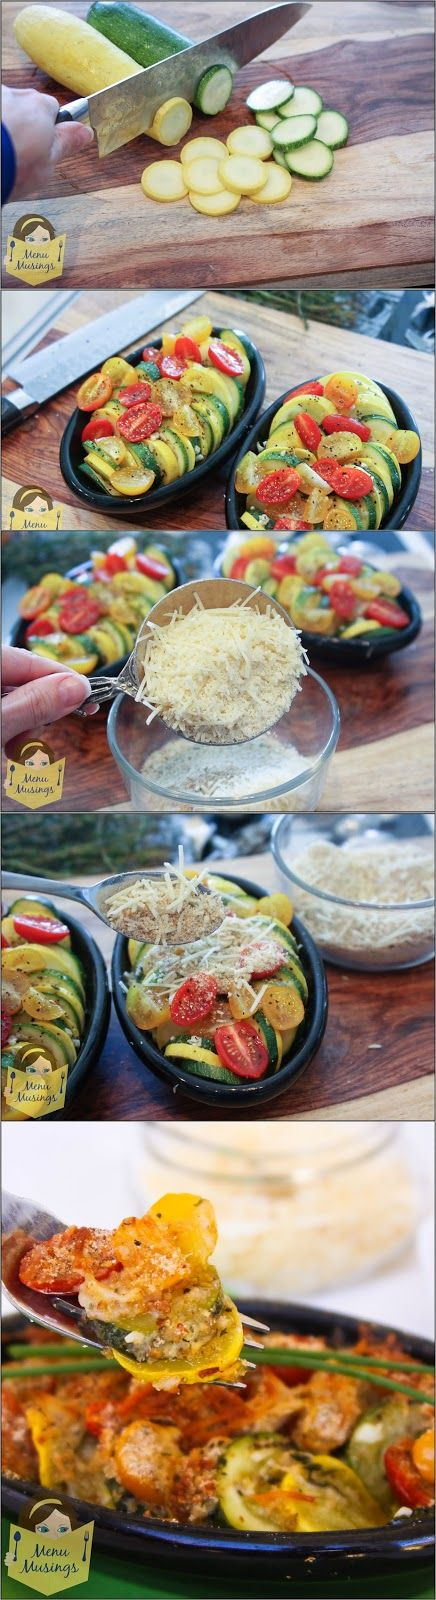 Parmesan Zucchini Gratin